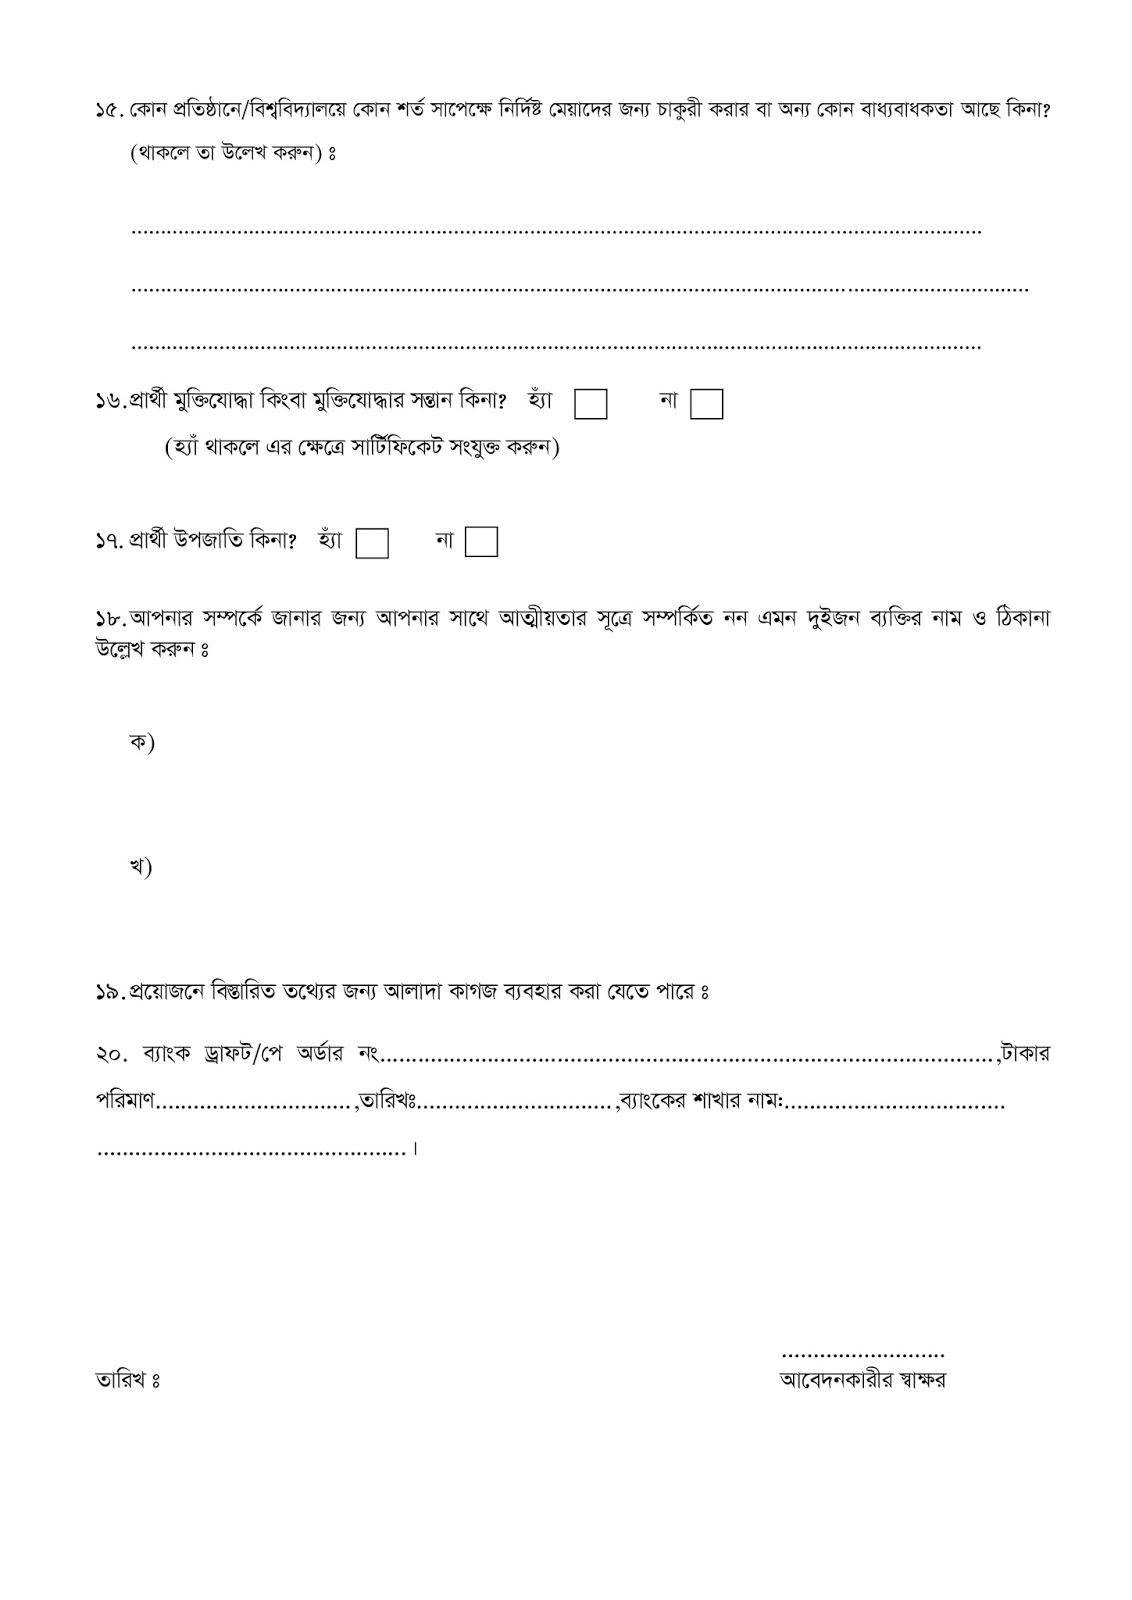 Patuakhali Science and Technology University (PSTU) Job Application Form